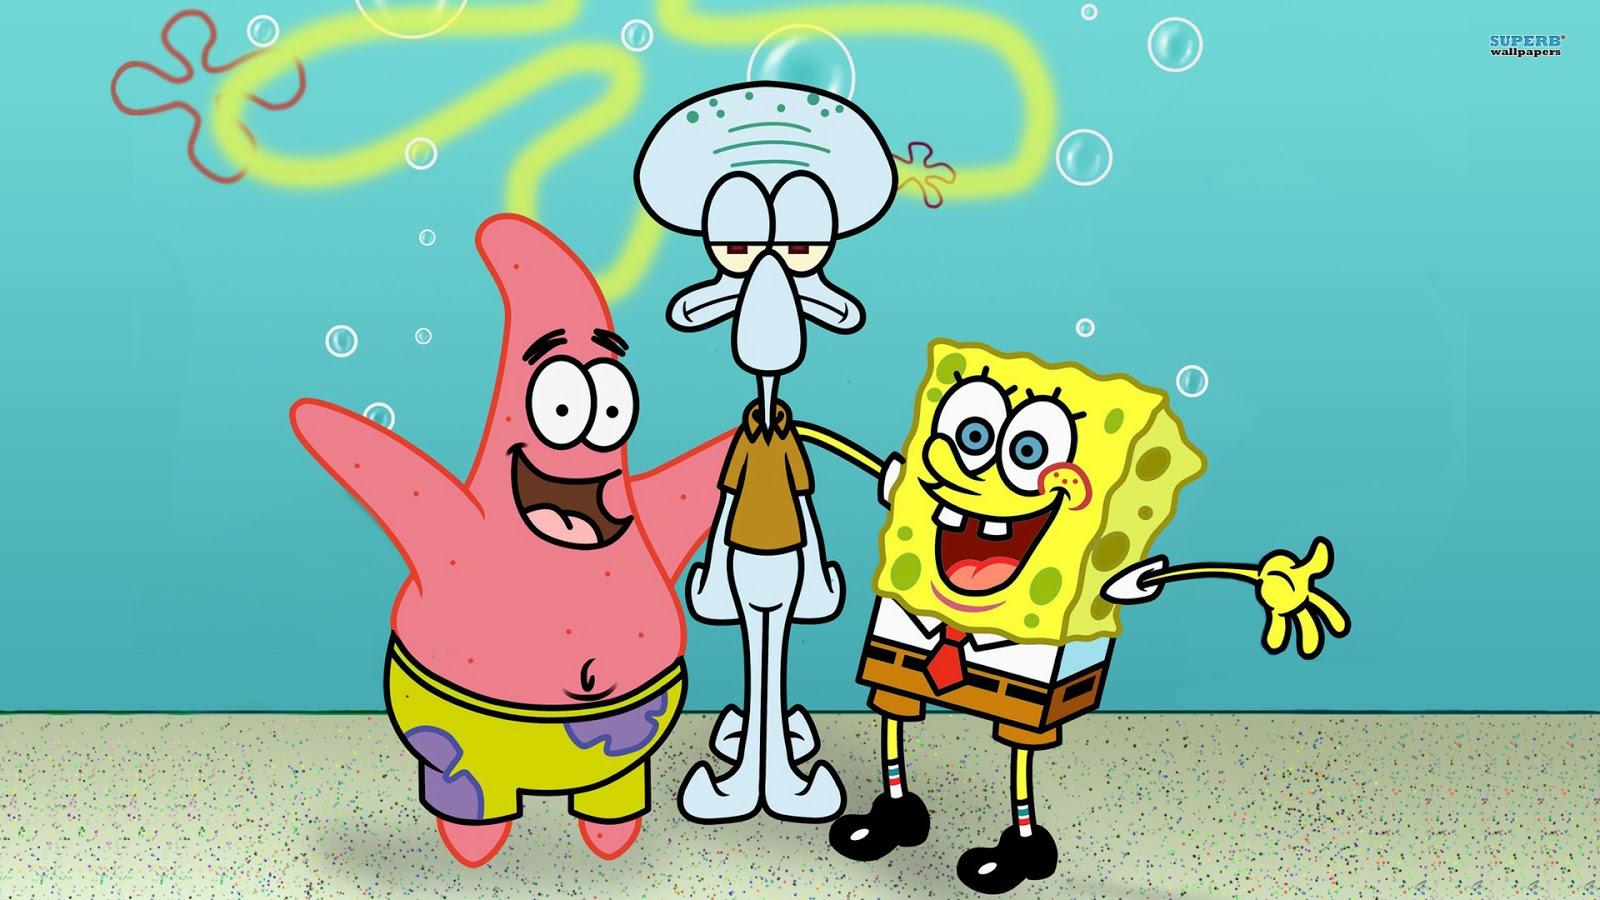 Kata Kata Bijak Dari Spongebob Squarepants Frackids